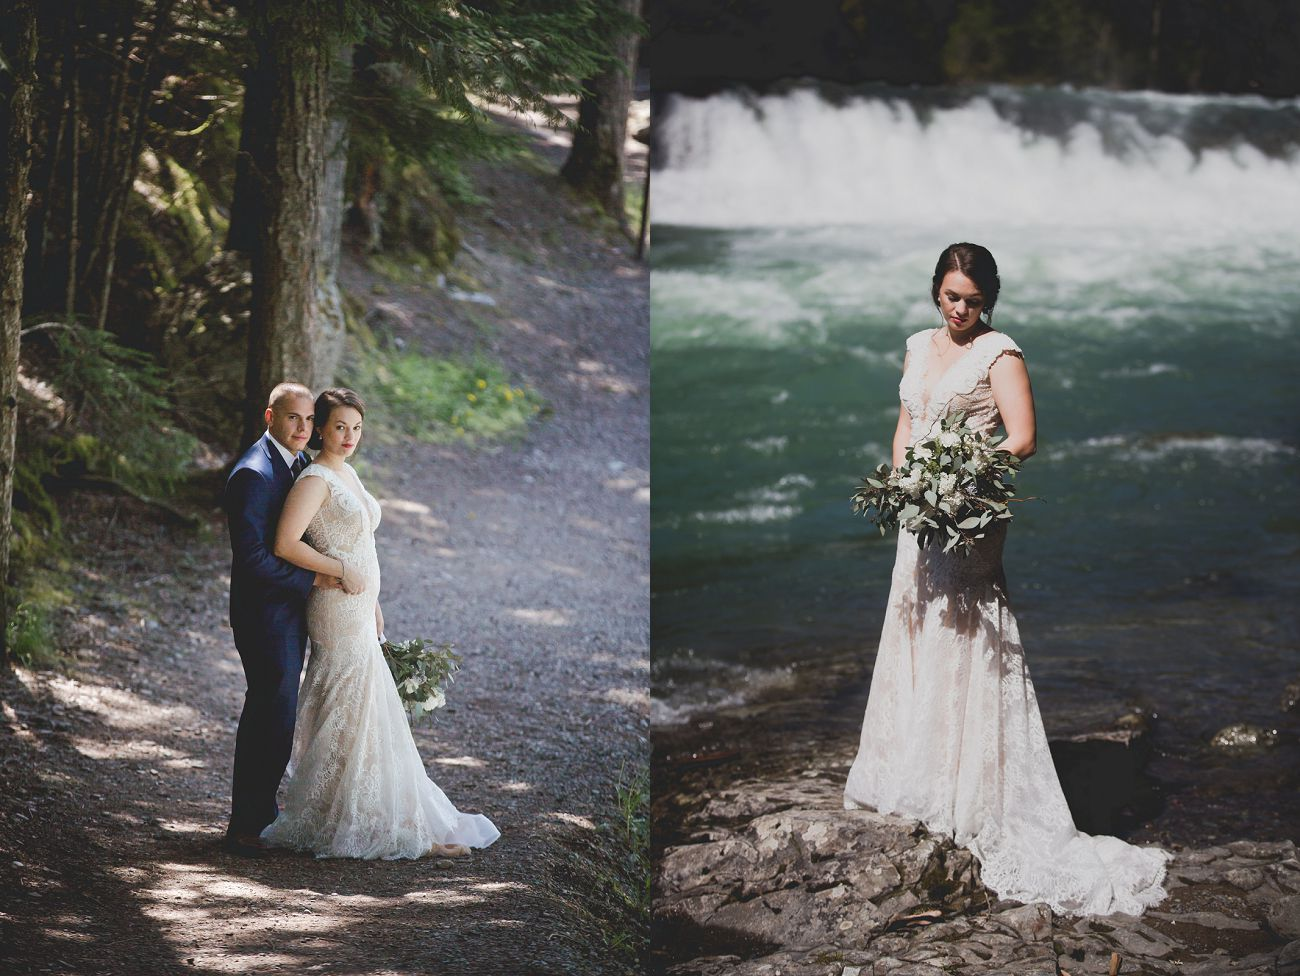 Jennifer_Mooney_Photo_Glacier_Park_Weddings_Elopement_00043.jpg